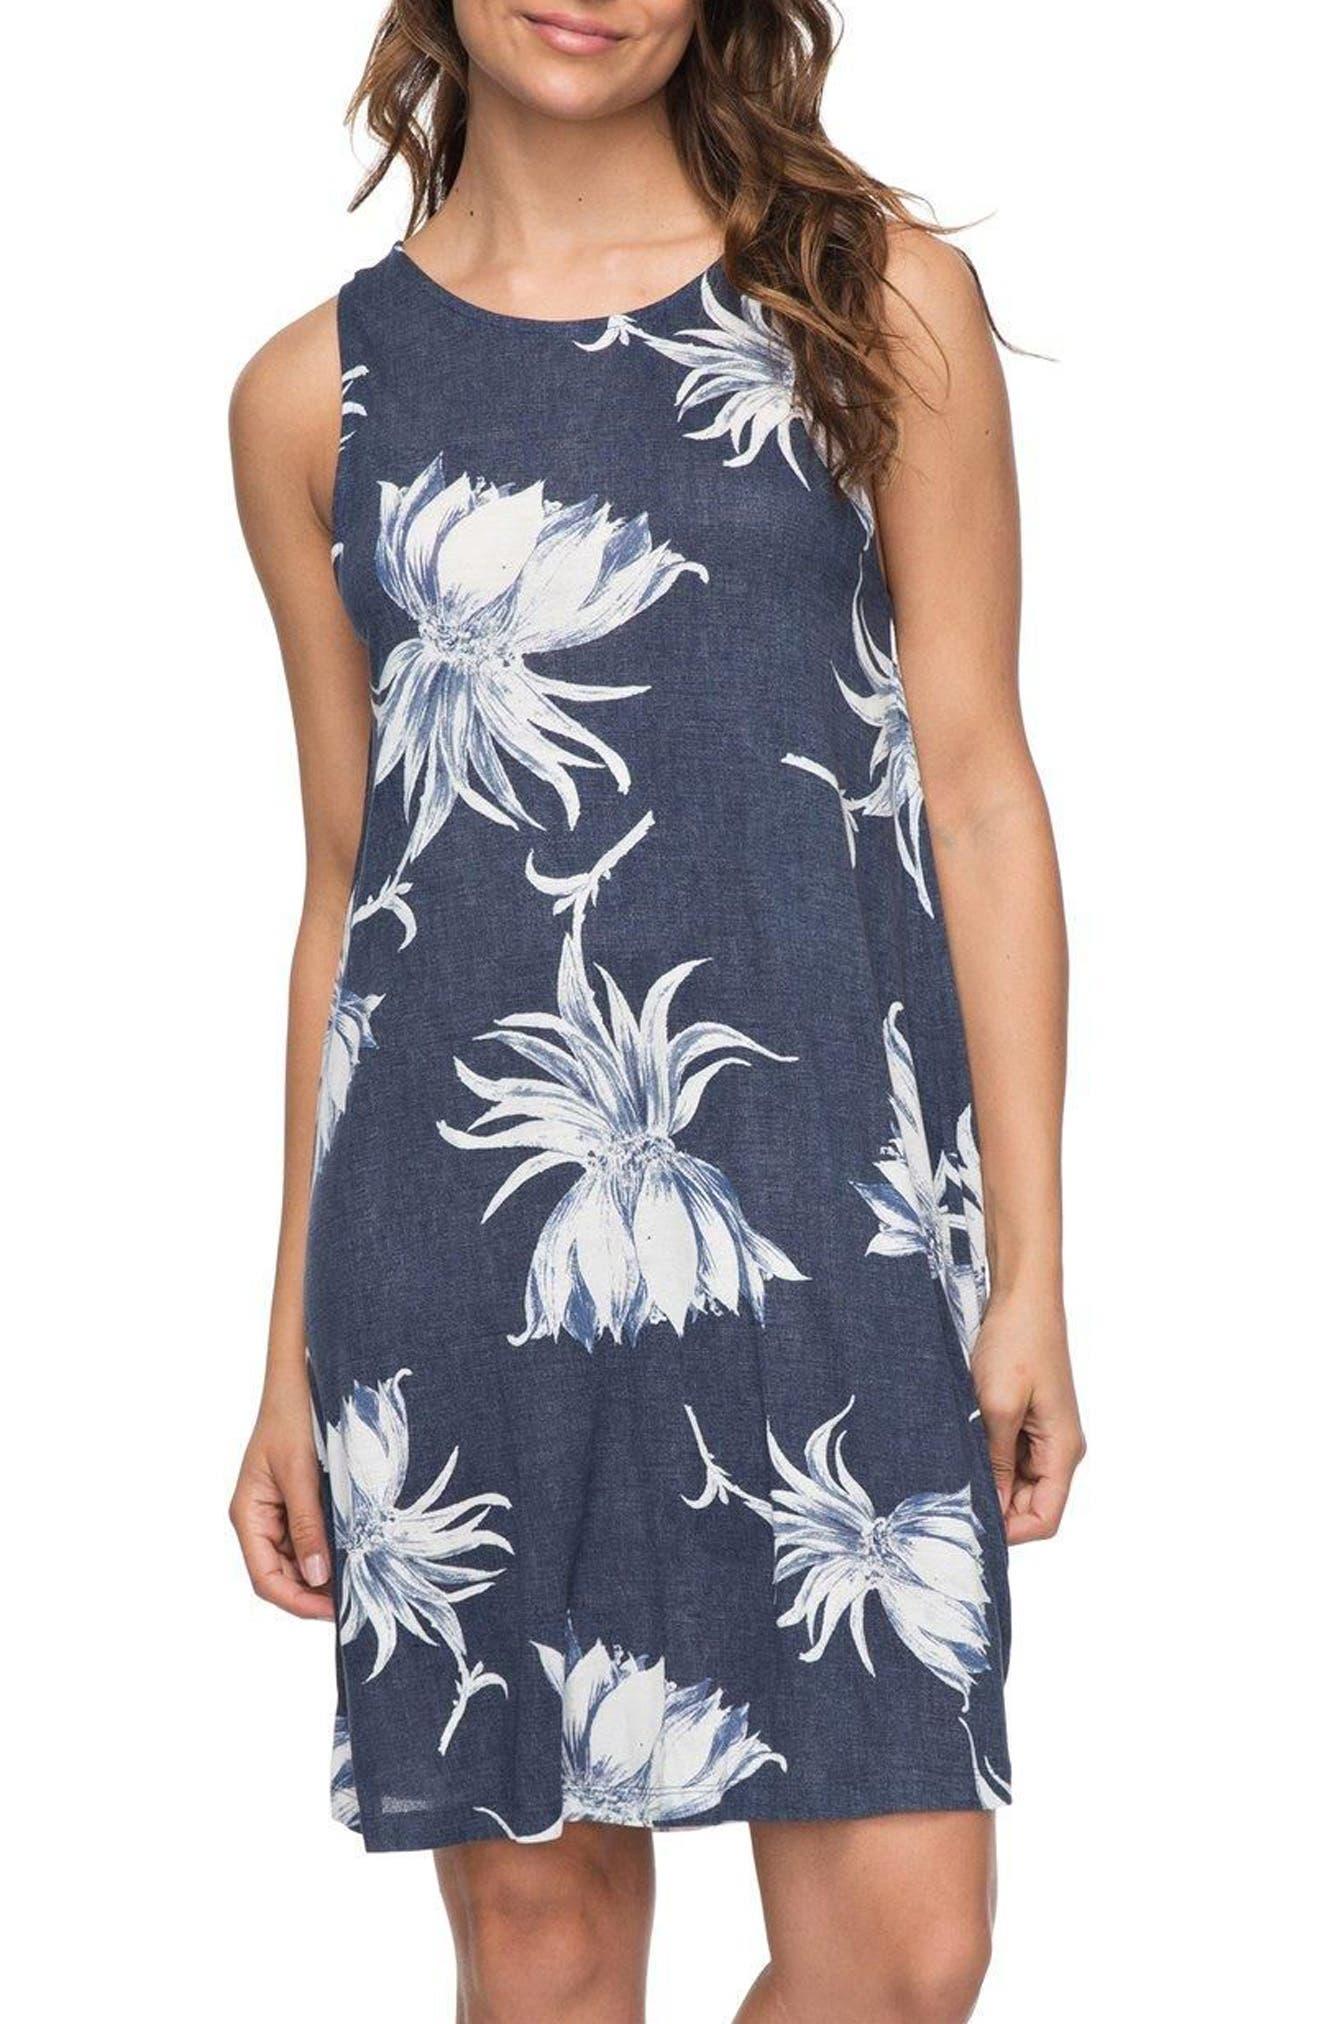 Sugar Space Shift Dress,                         Main,                         color, Dress Blue Cadaques Flower